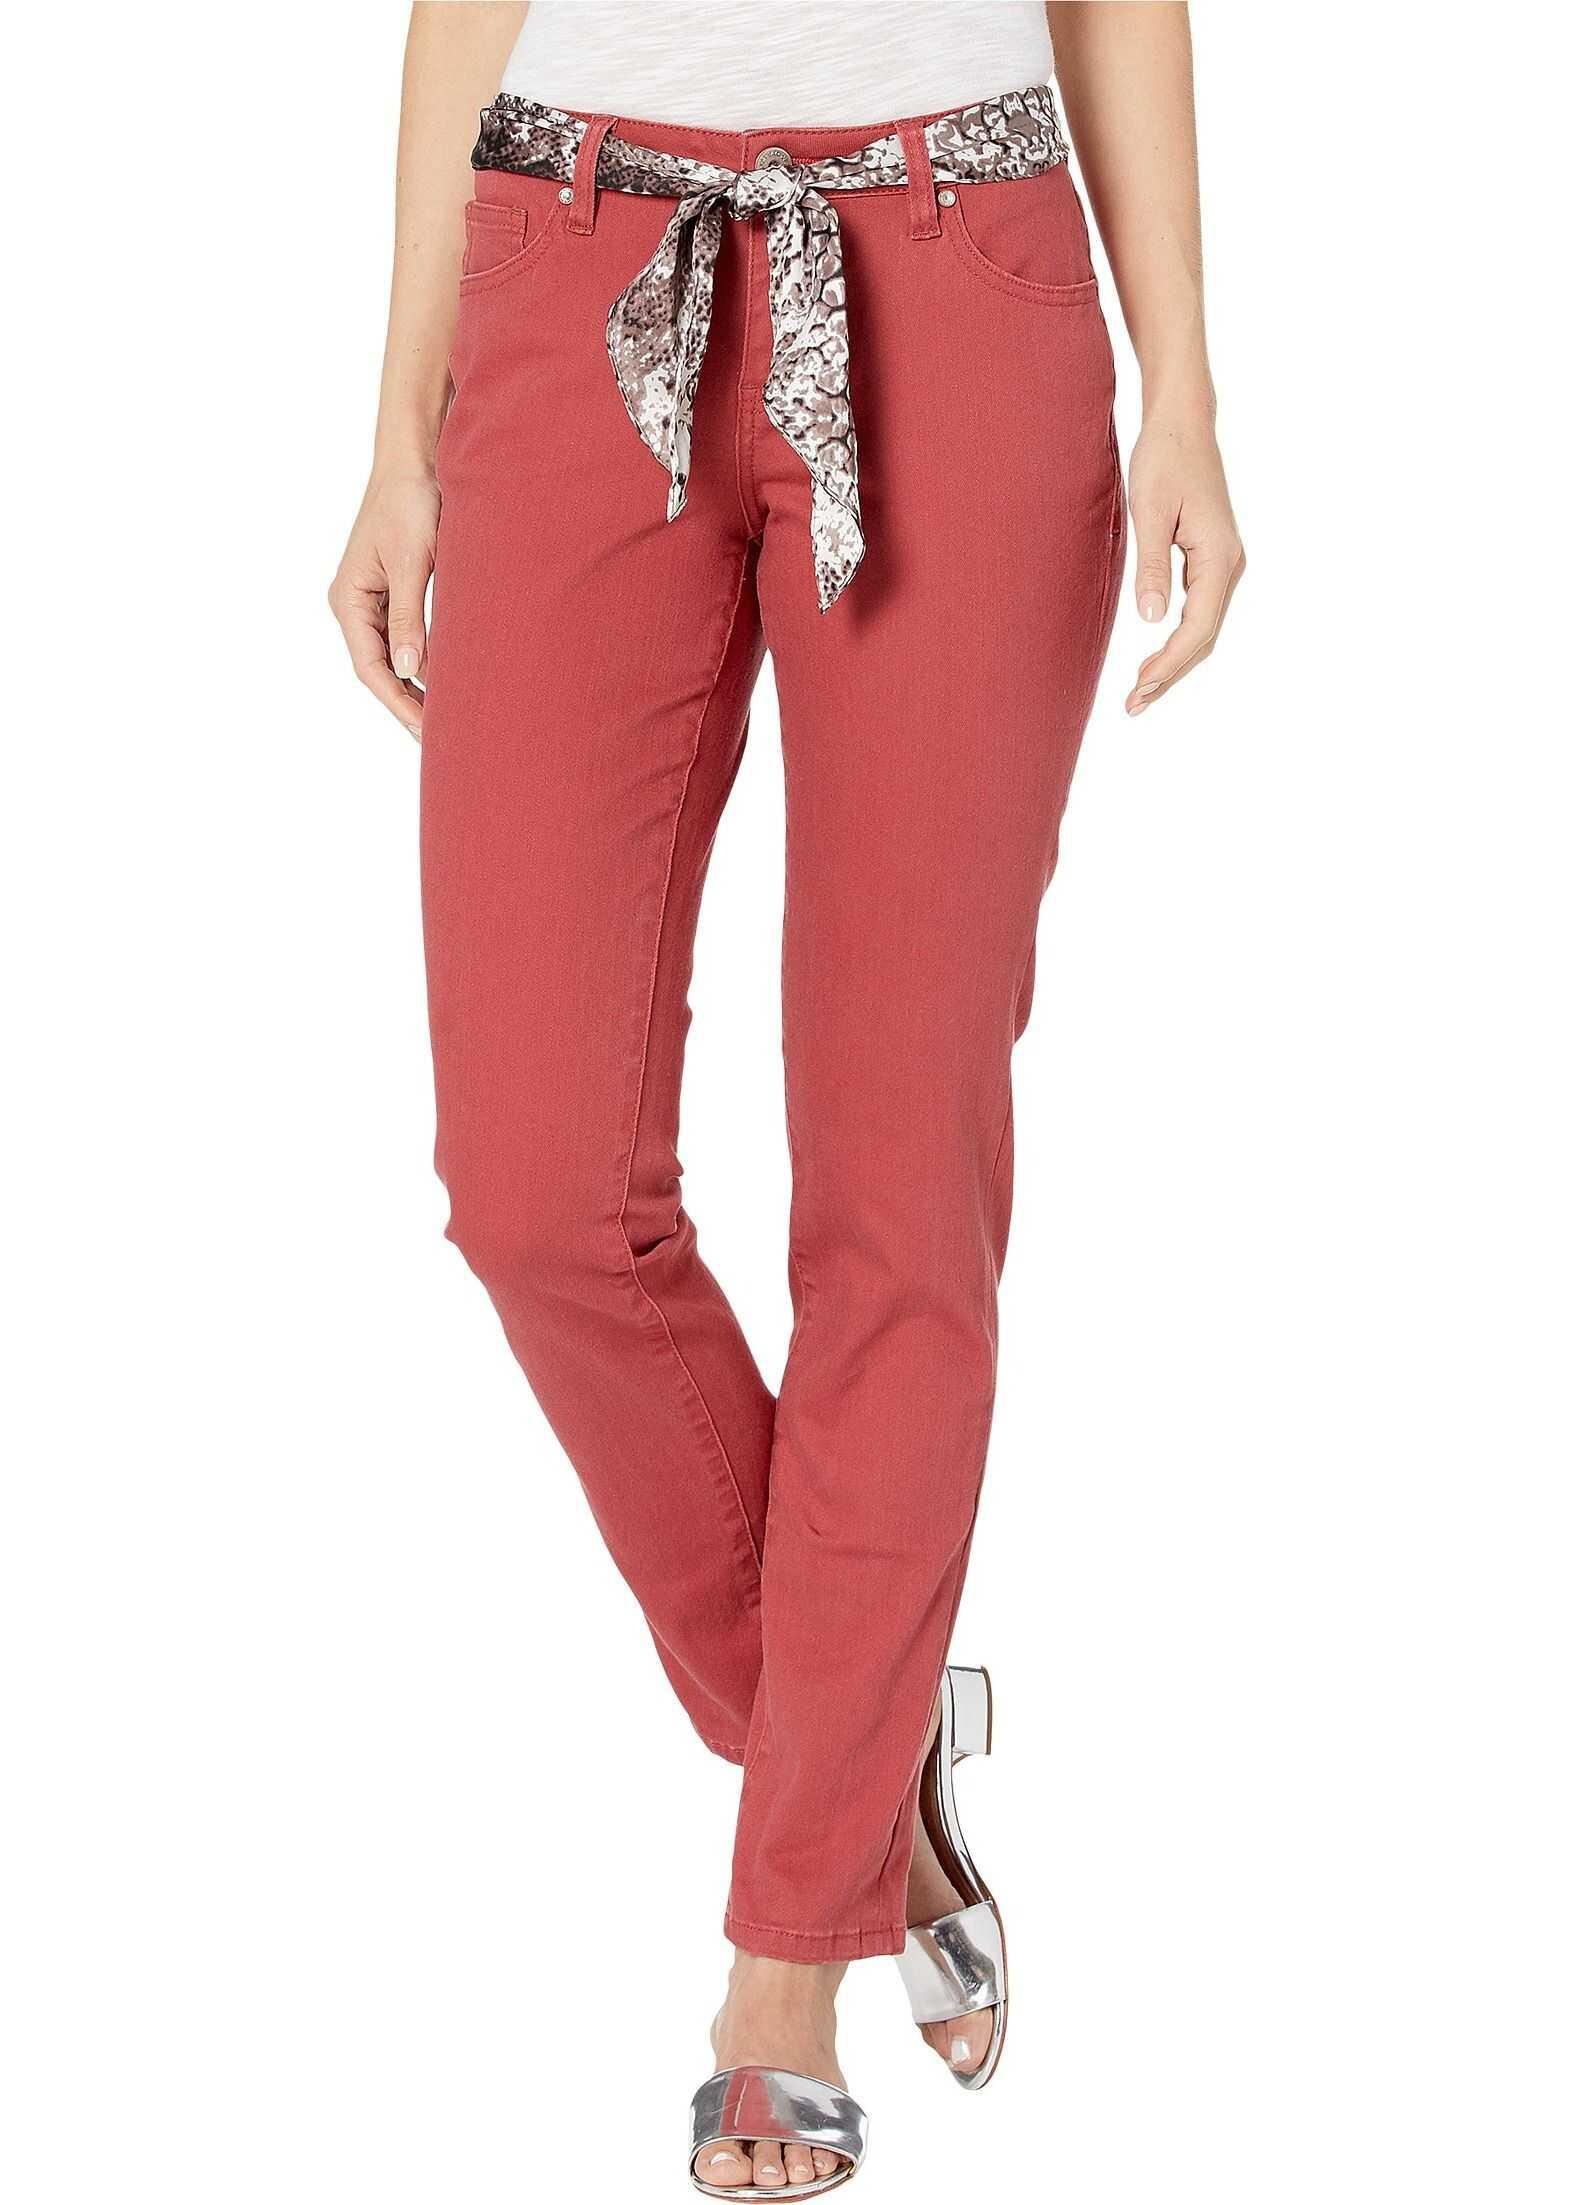 Jag Jeans Carter Girlfriend Jeans with Satin Belt Redwood